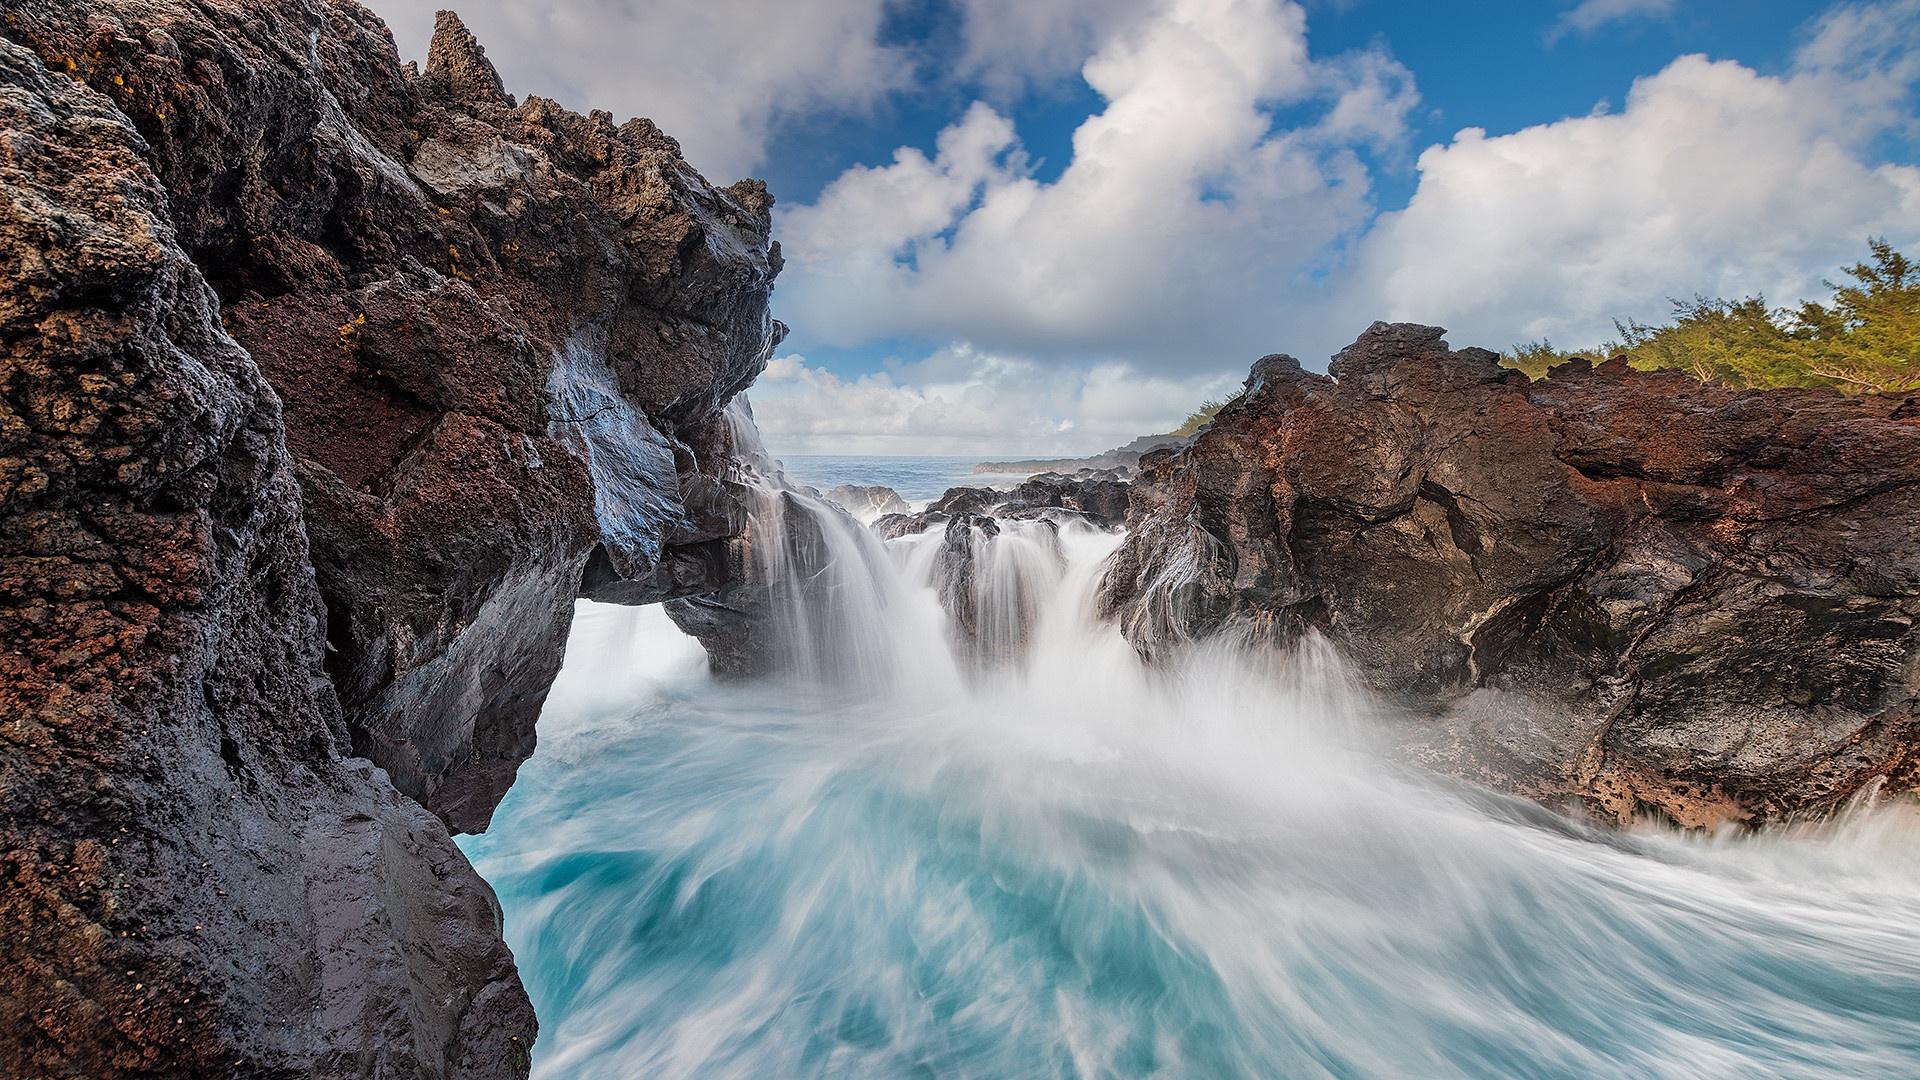 Indian Ocean Coast Water Rock Nature La Reunion Island 1920x1080